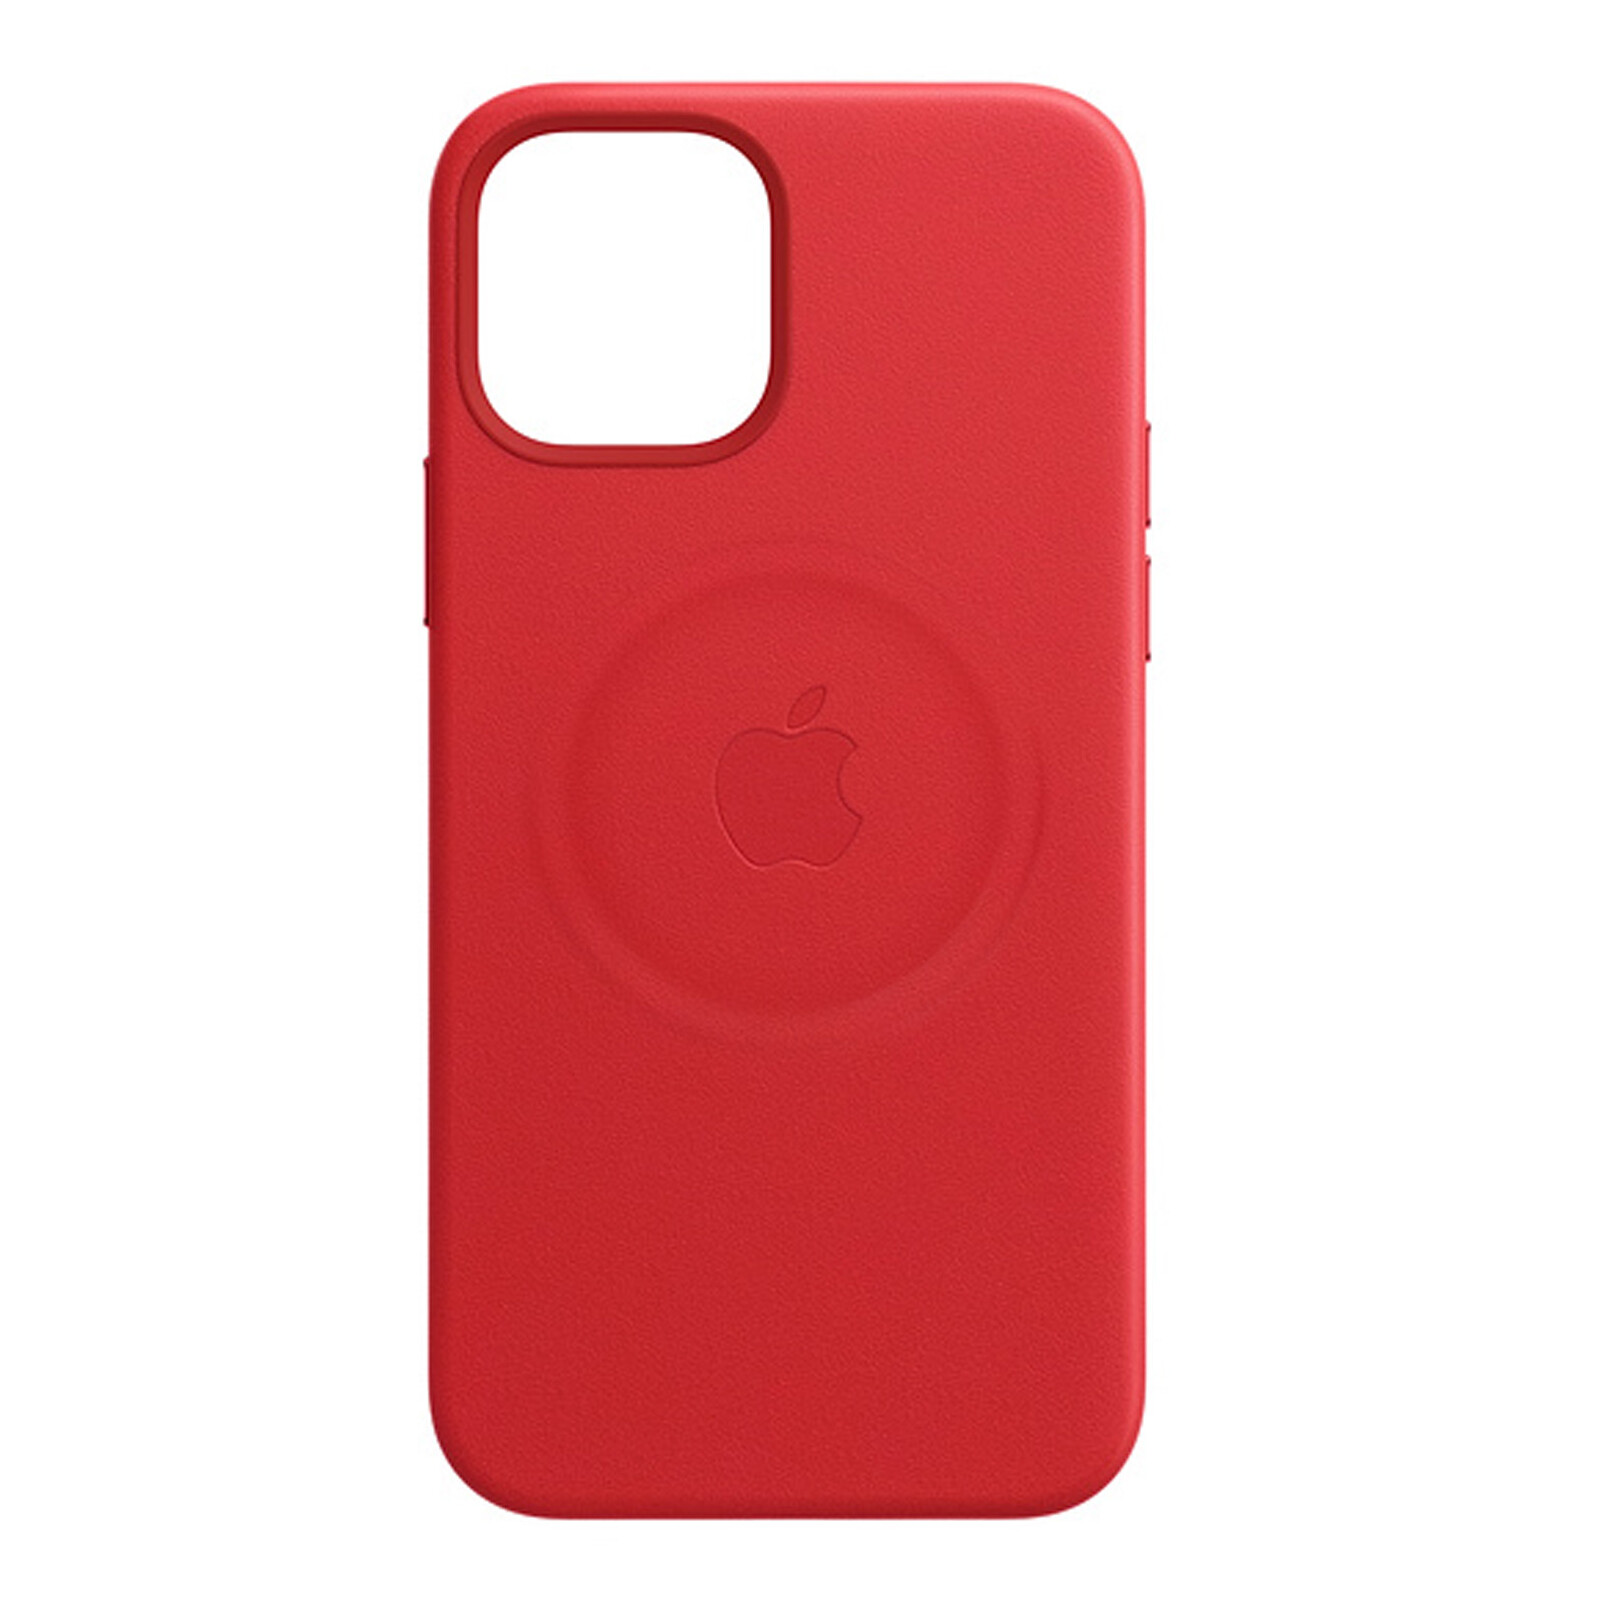 Apple iPhone 12 mini Leder Case mit MagSafe product red